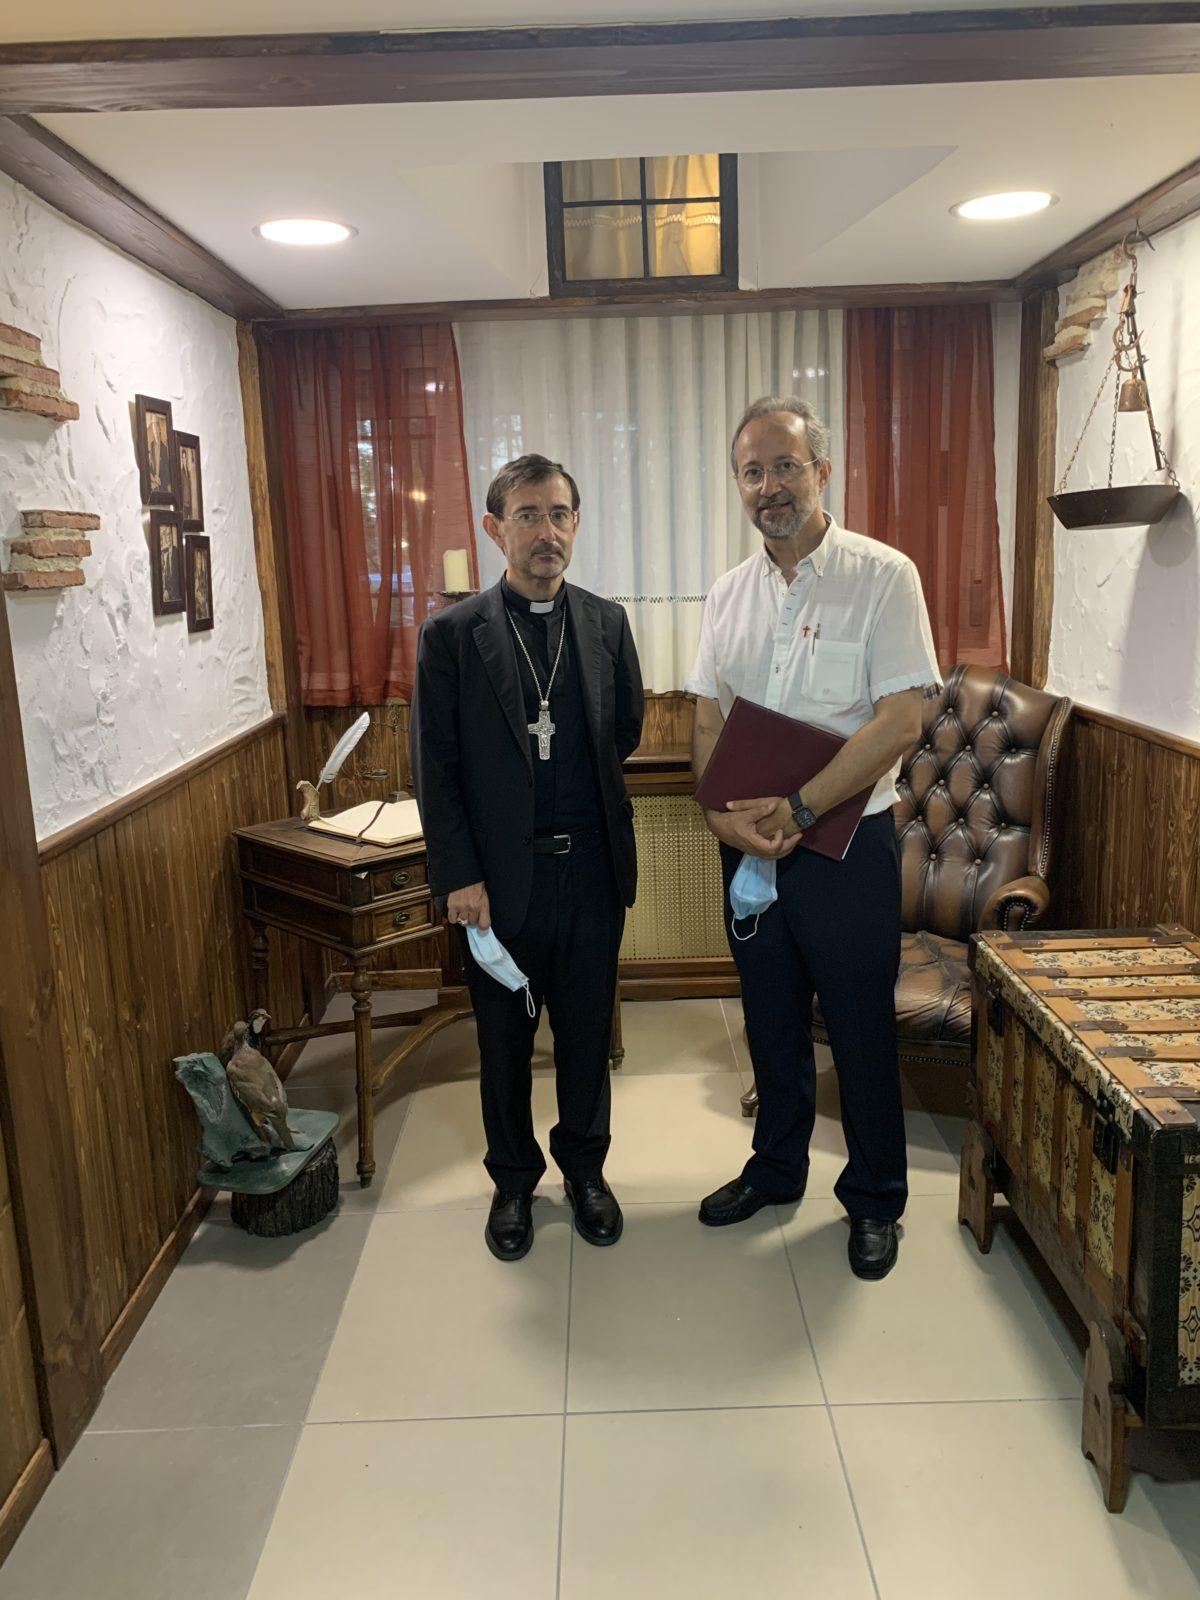 Monseñor José Cobo y Bermejo celebran San Camilo